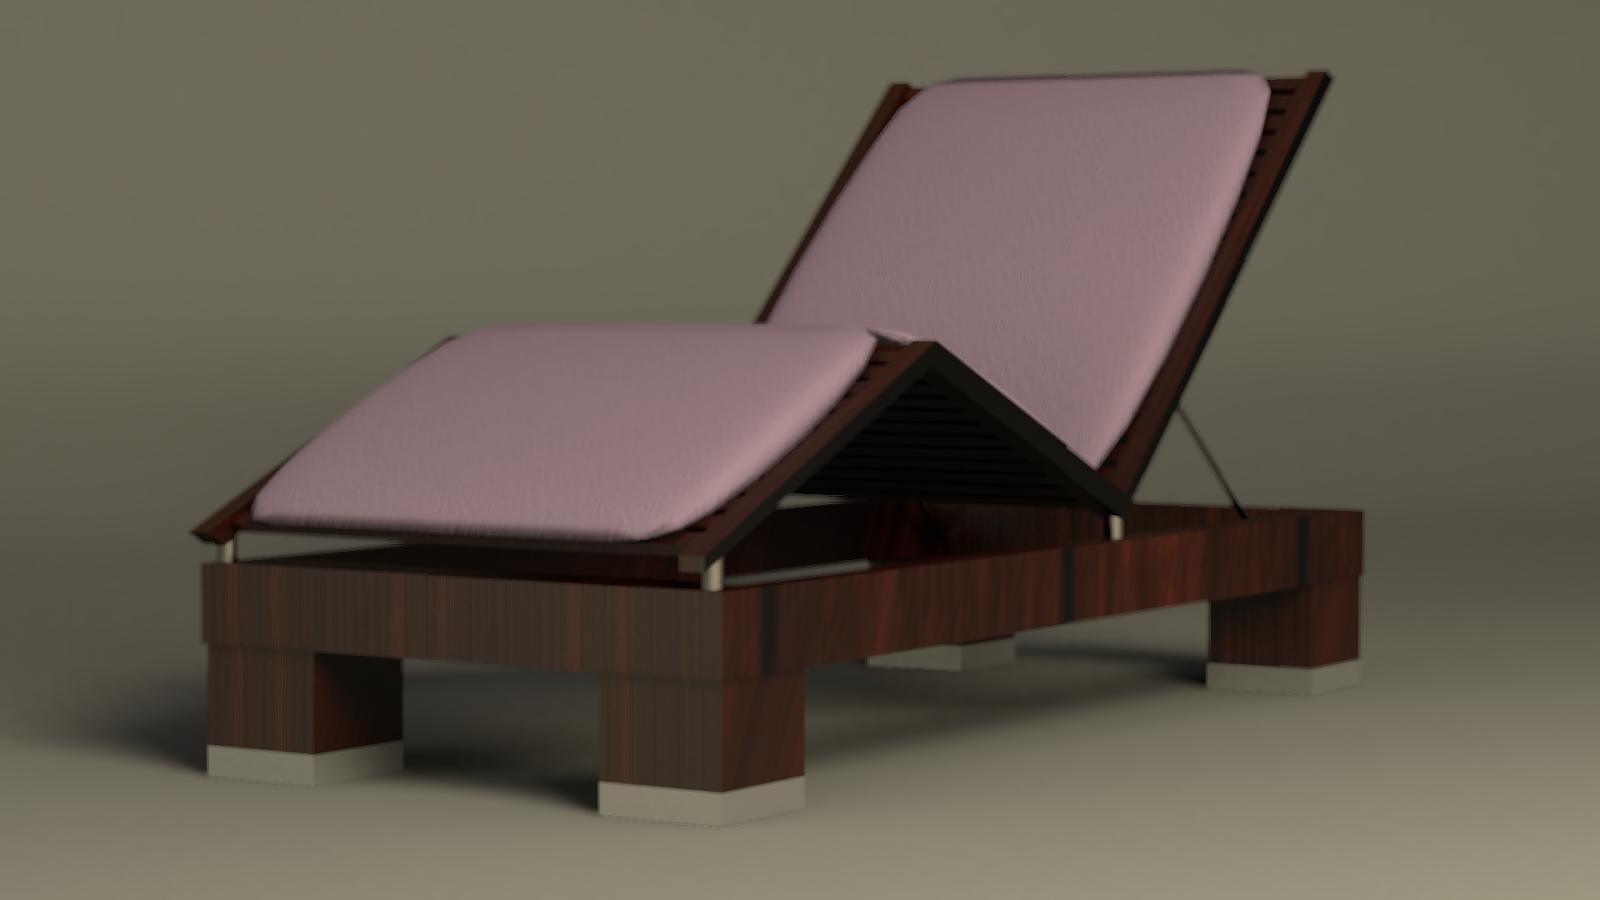 ÍcaroFillip 3D: Cadeira de madeira para piscina Blender 2.64 Cycles #312820 1600x900